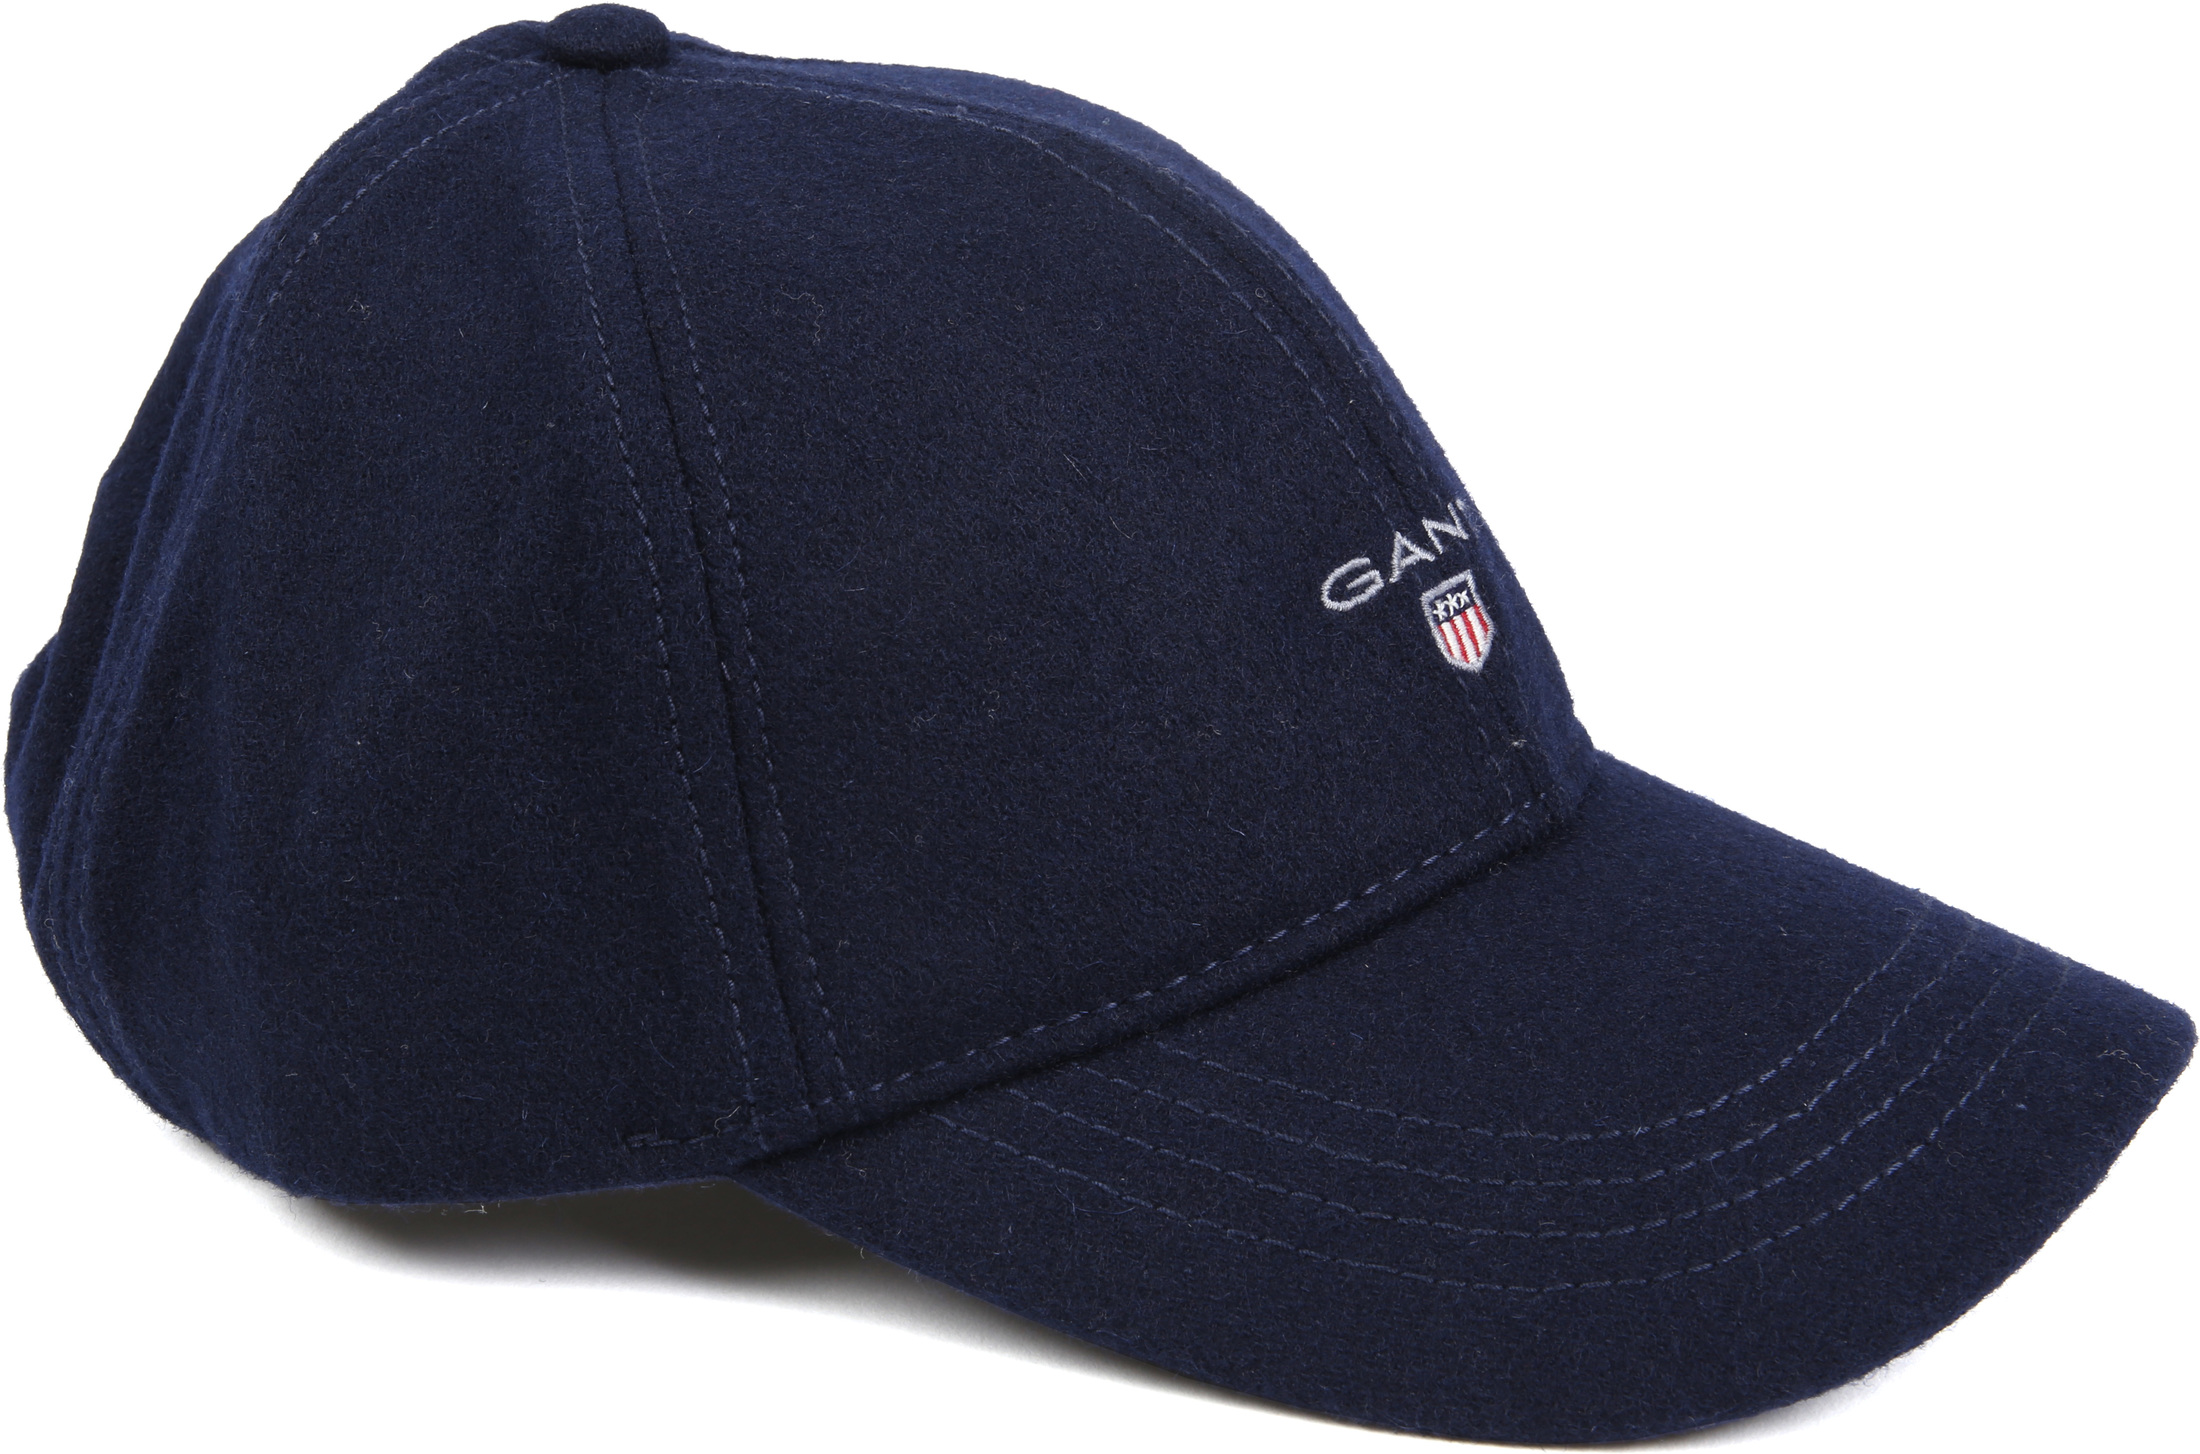 6edaaa54959 Gant Cap Melton Navy 9900006-405